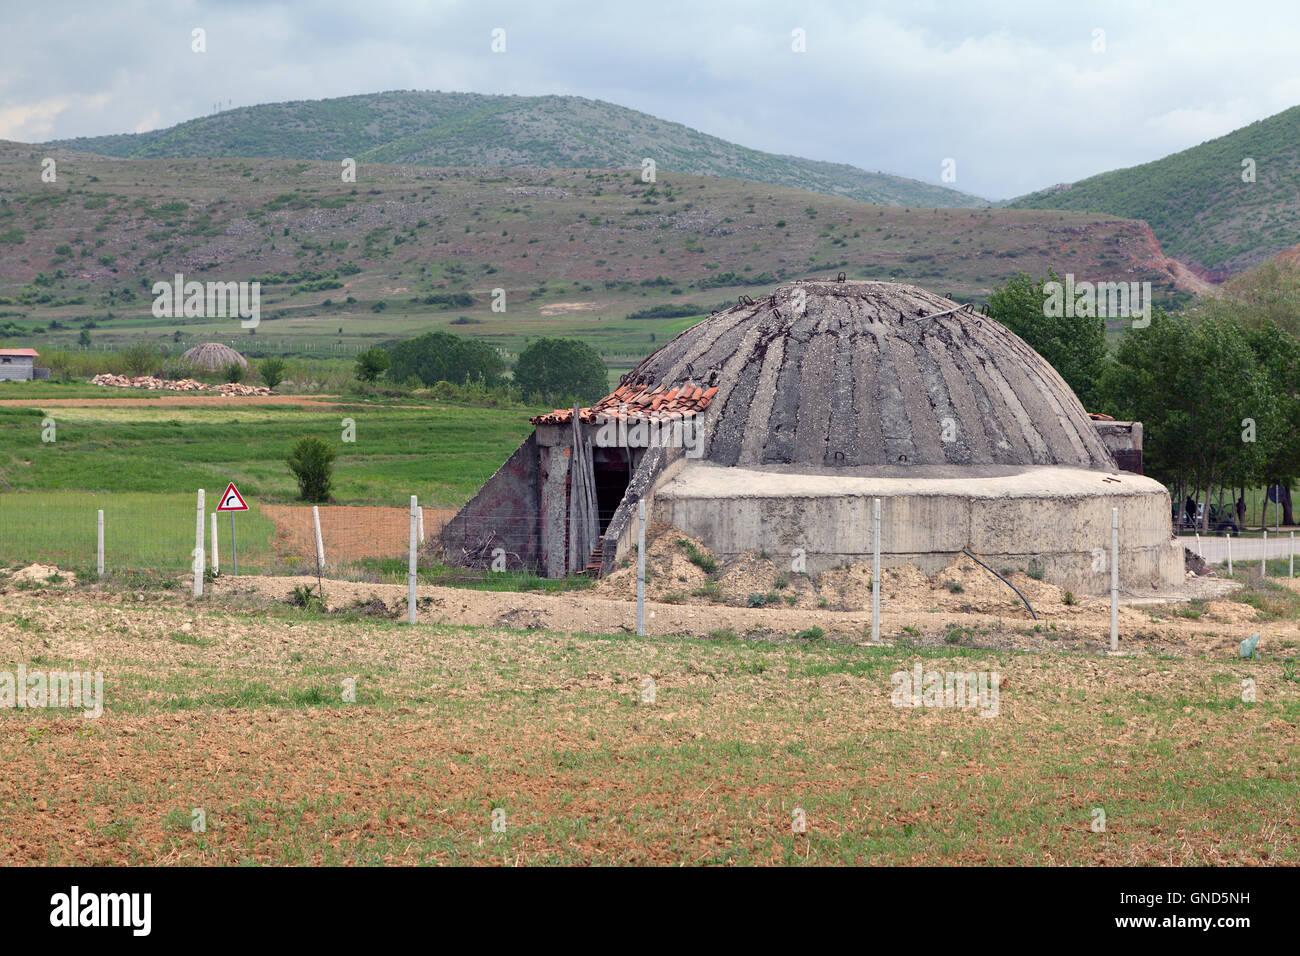 Abandoned communism era concrete bunker, Albania - Stock Image